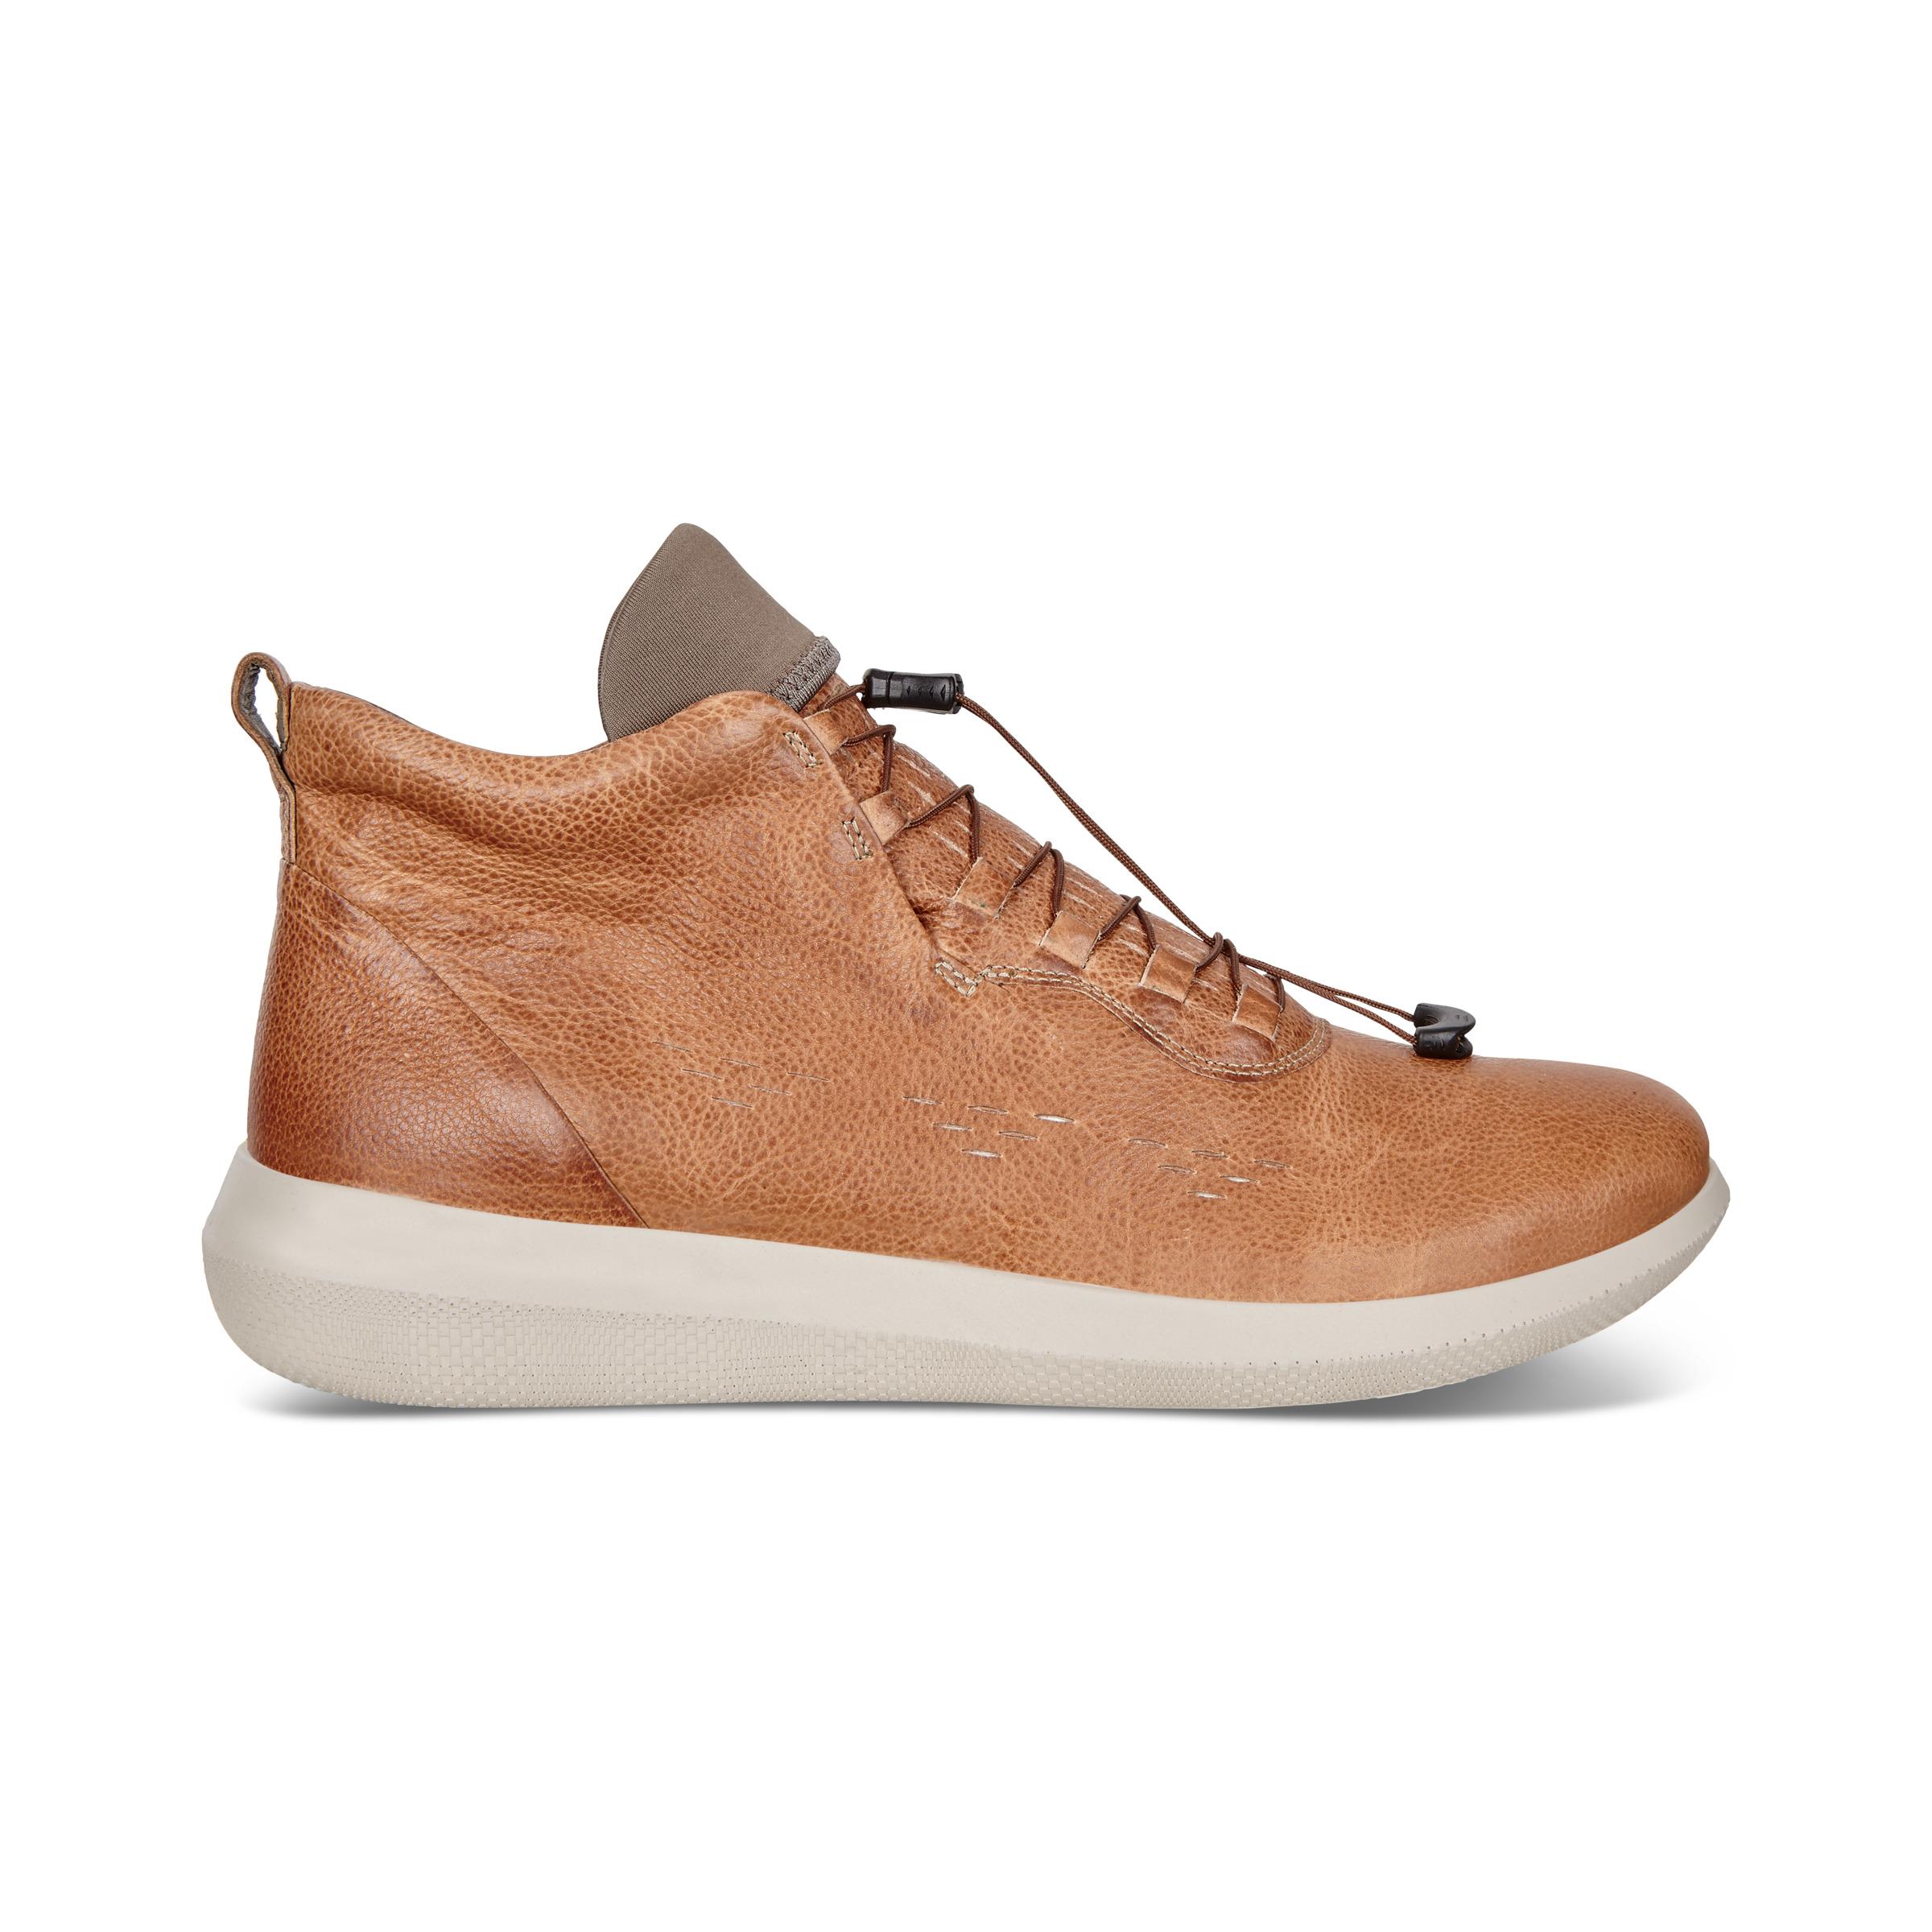 ECCO Mens Scinapse High Top Sneakers Size 11-11.5 Volluto